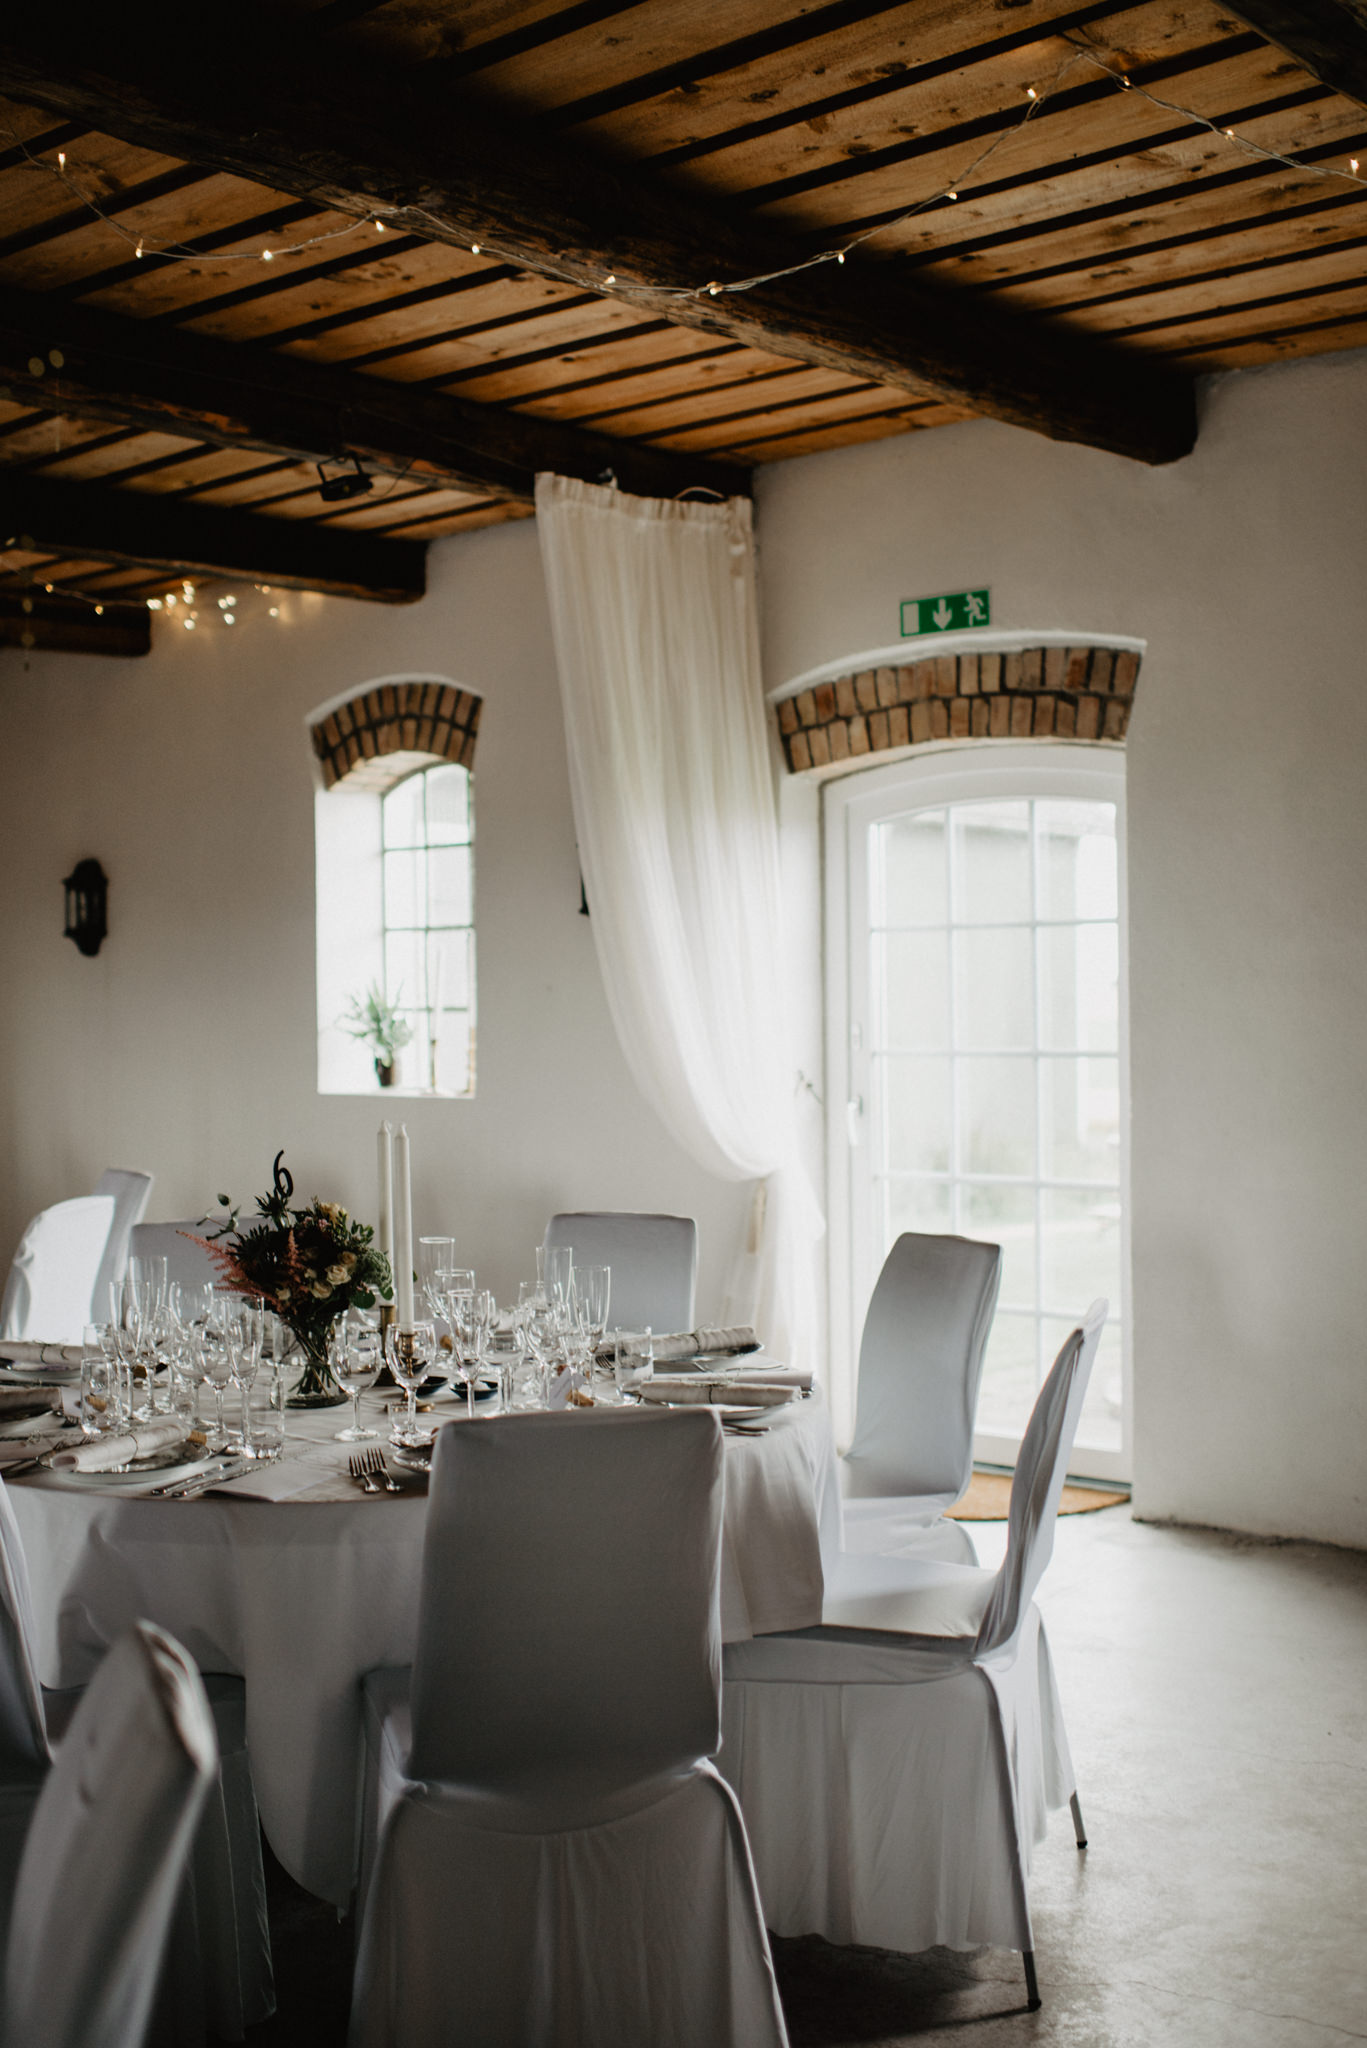 bohemiskt-bröllop-inspiration-dukning-nygård-event-bröllopsfotograf-skåne32.jpg